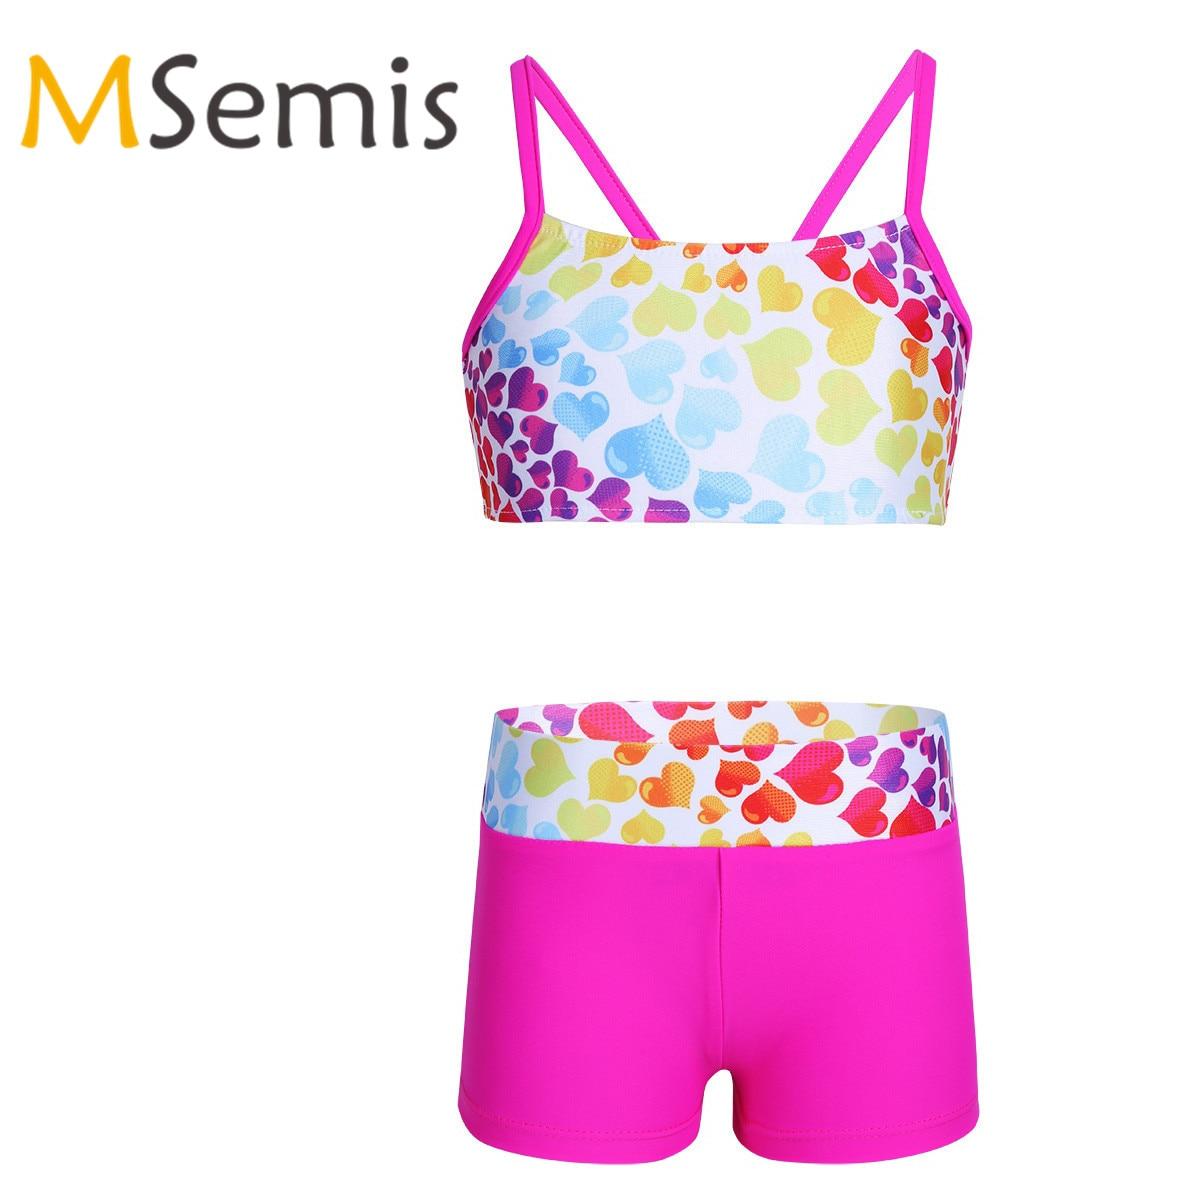 Kids Girls Tankini Swimsuit Gymnastics Leotard Heart-shaped Two Piece Swimwear Set Swimsuit Tops With Bottoms Beach Bathing Suit